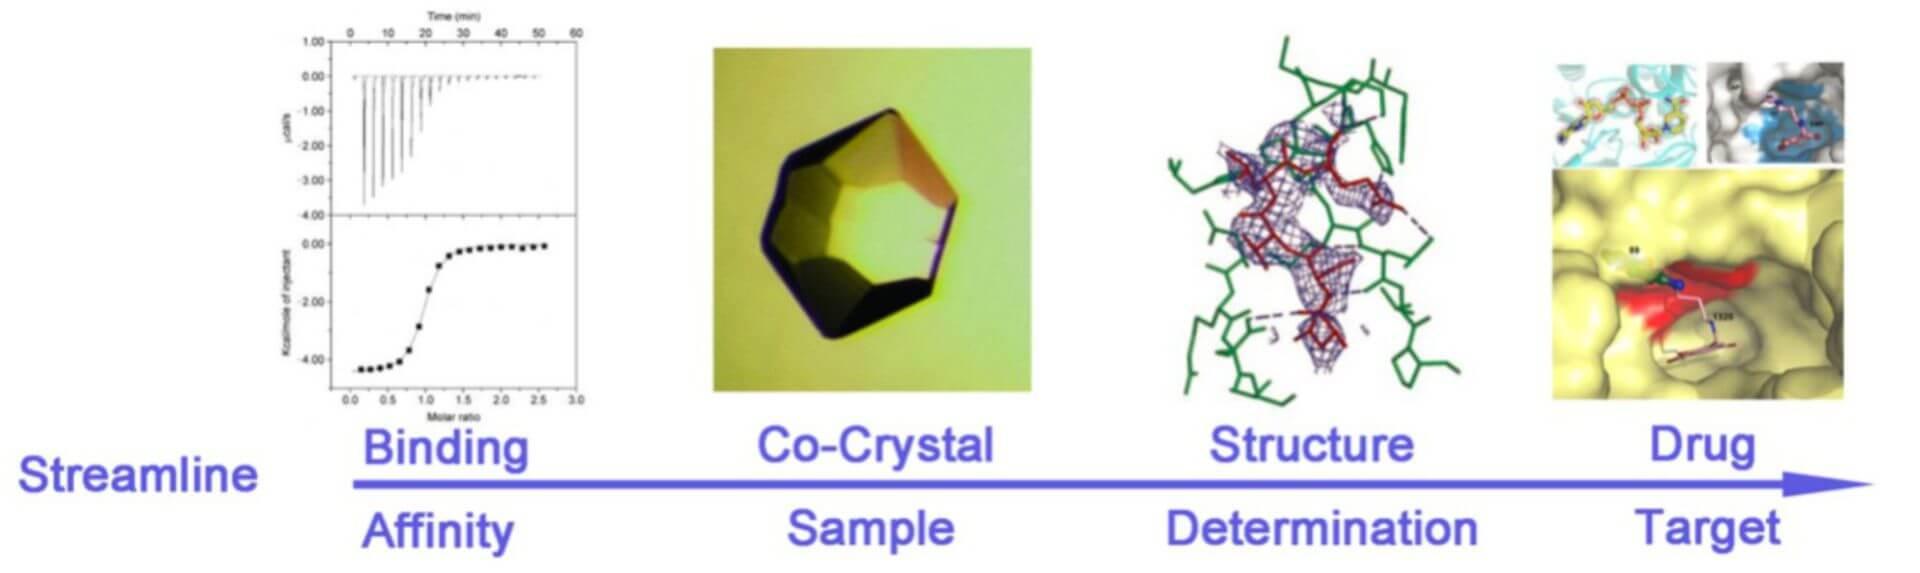 Co-crystallization